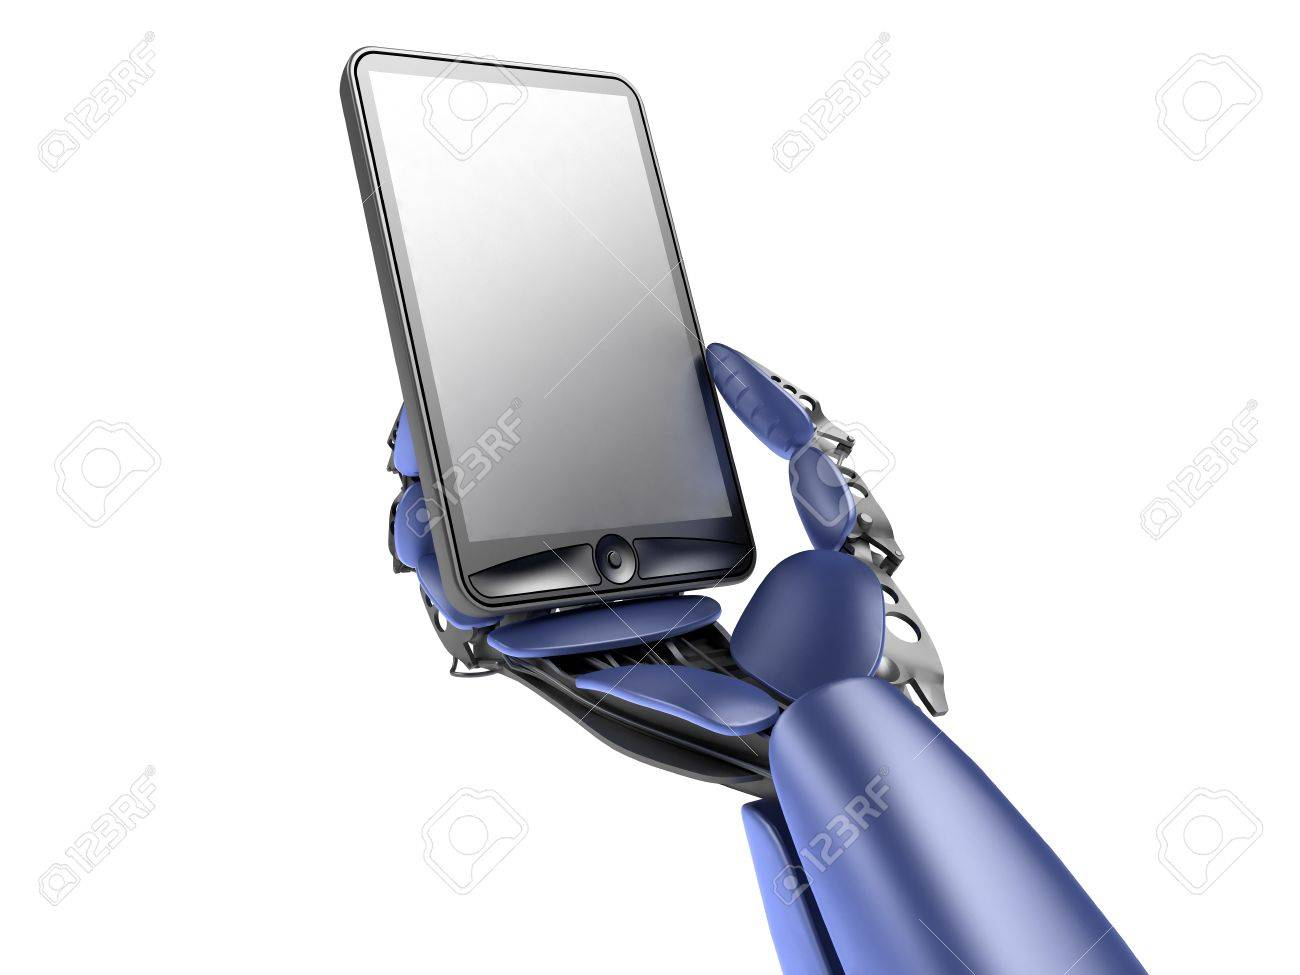 cyborg with phone Stock Photo - 10778593